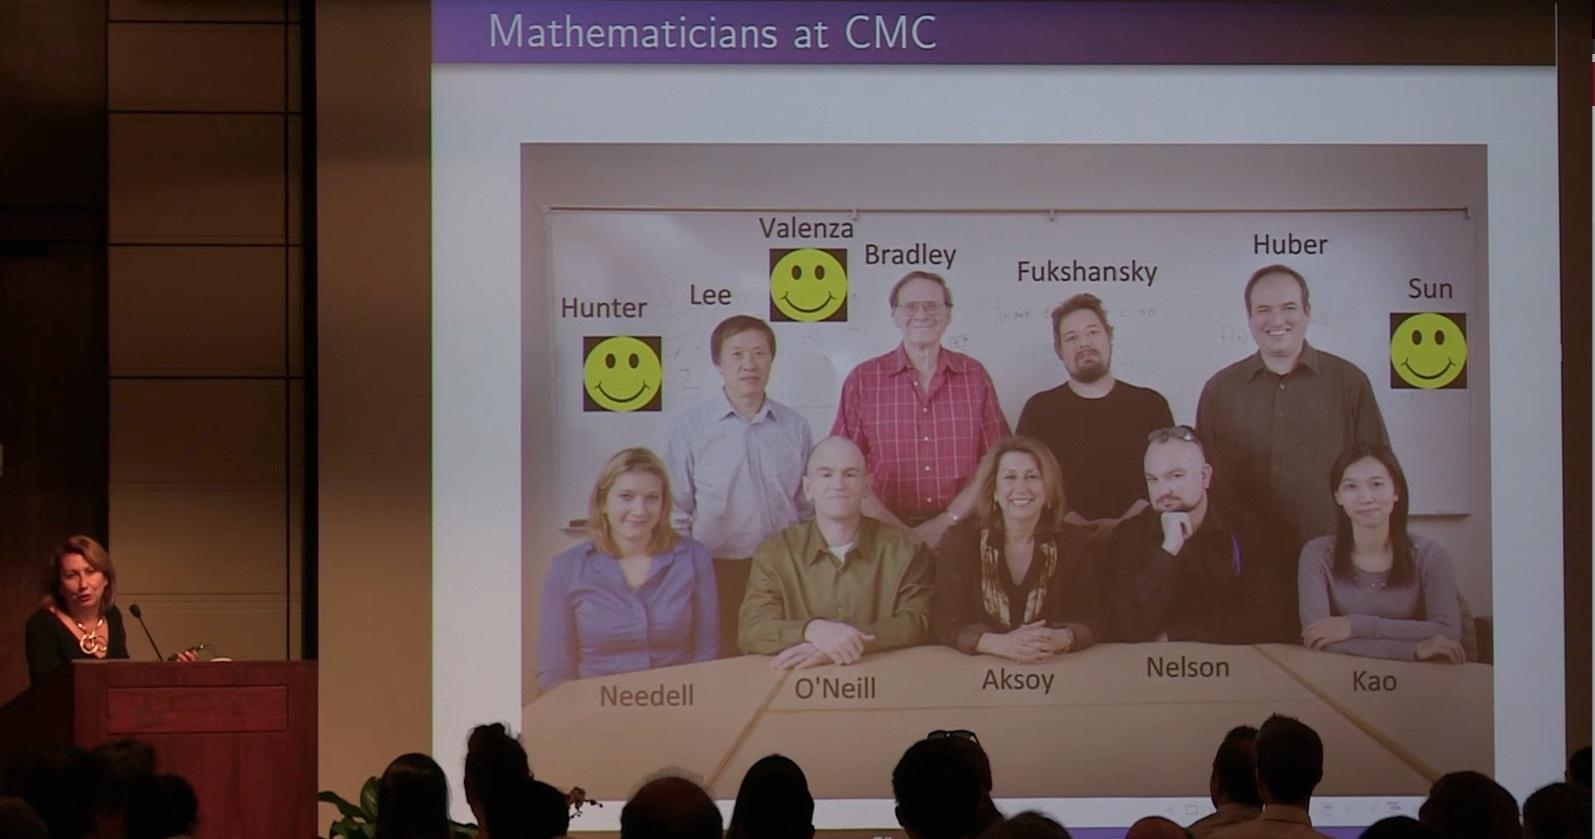 CMC Mathematics faculty